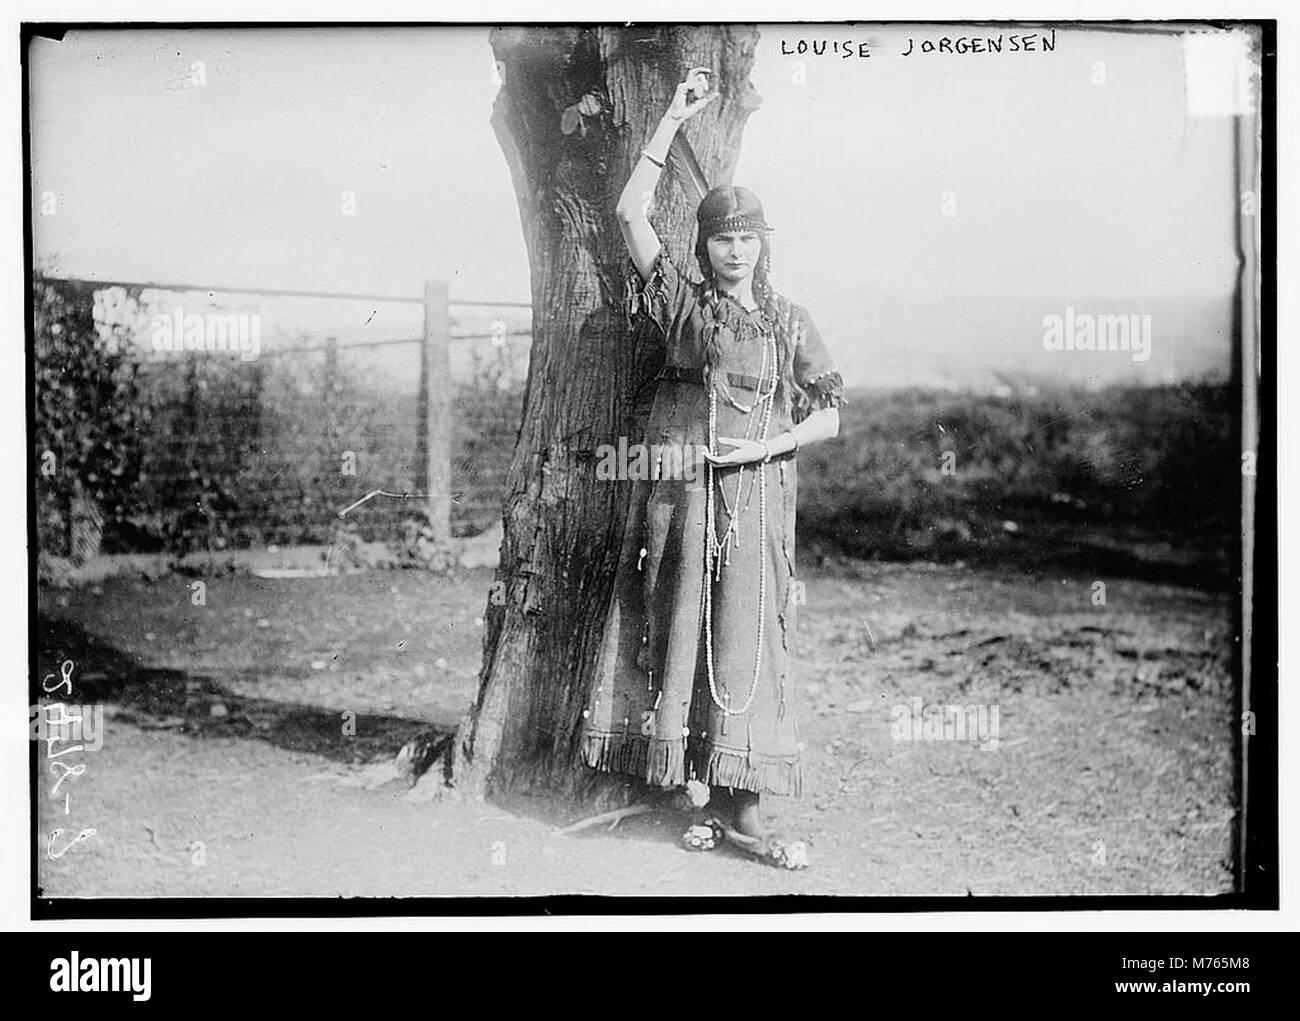 Louise Jorgensen in Indian dress LCCN2014691243 - Stock Image